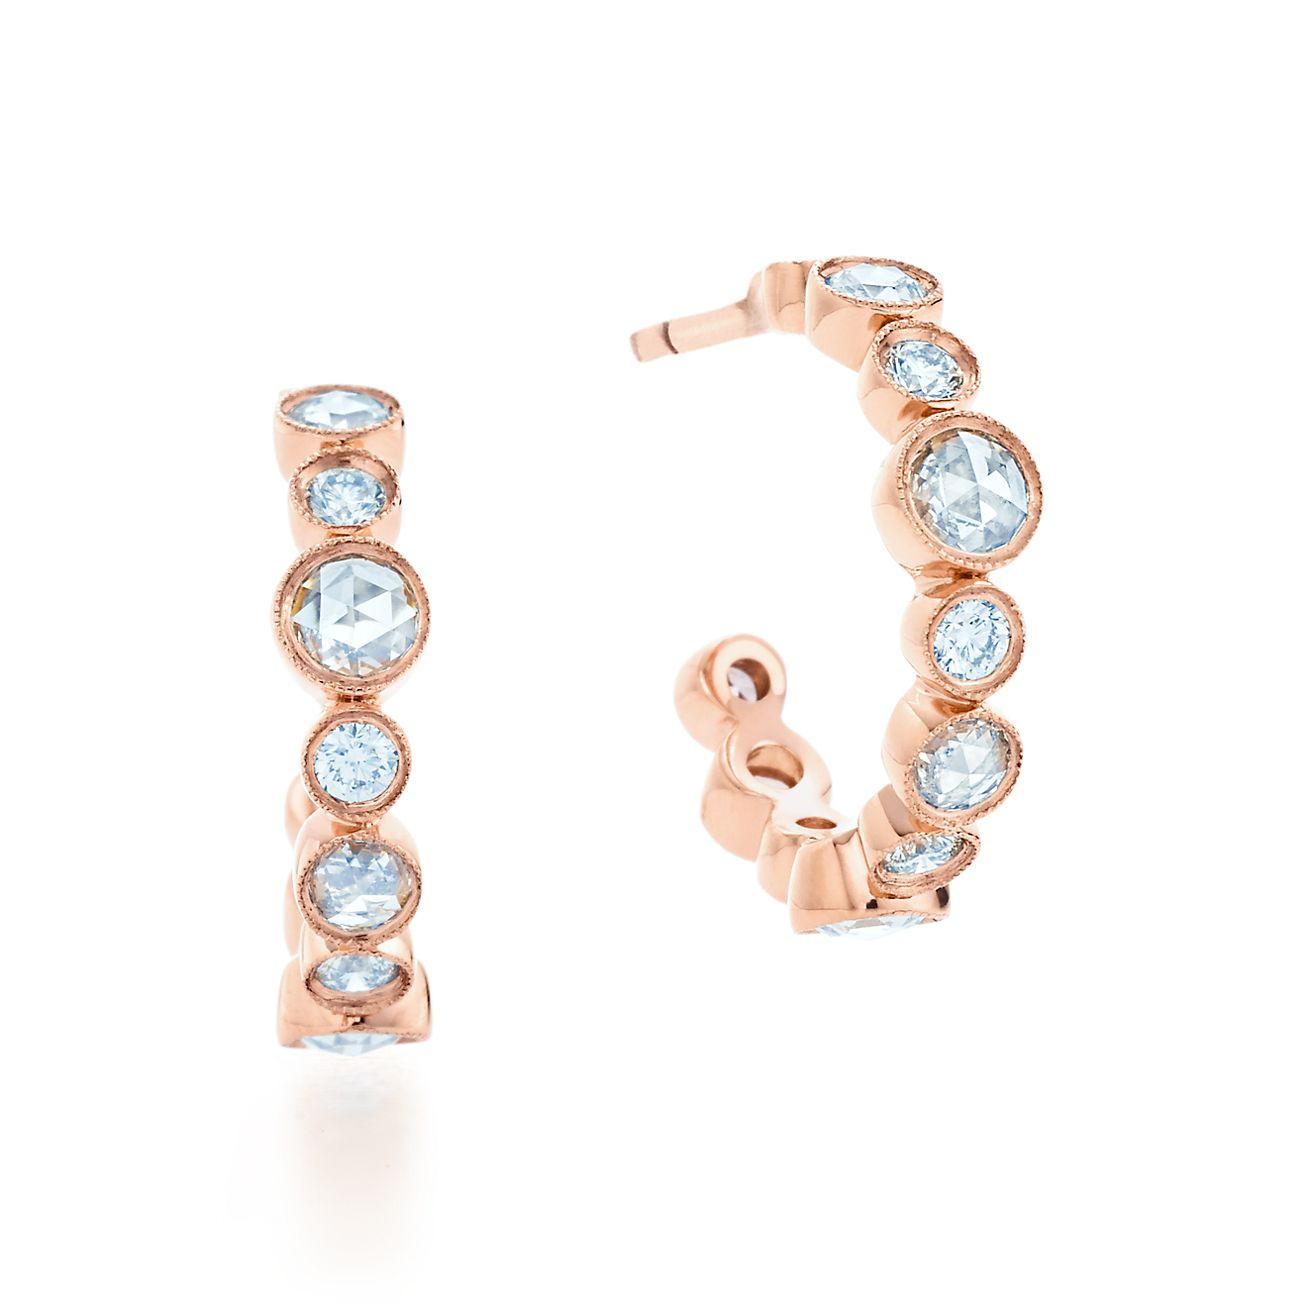 tiffany cobblestone hoop earrings in 18k rose gold with